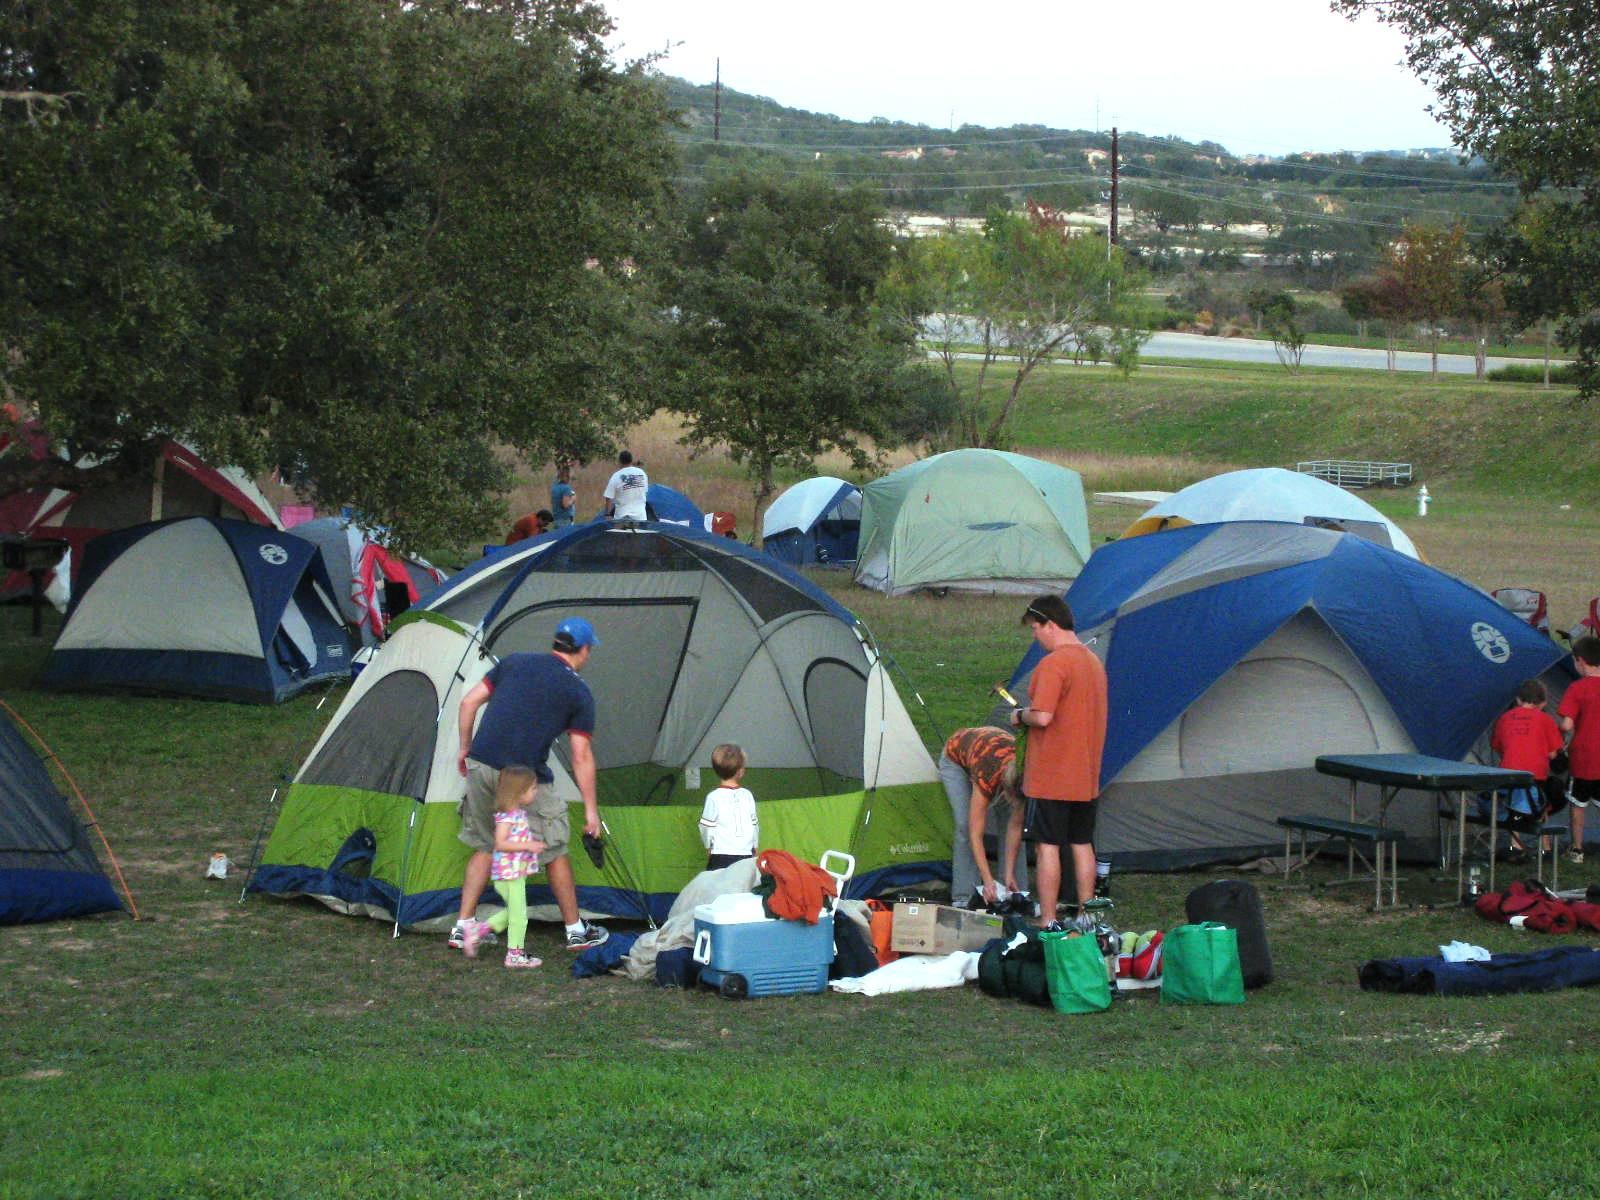 Http Humanspiritofadventure Blogspot Com 2013 05 Camping Rite Of Passage Html